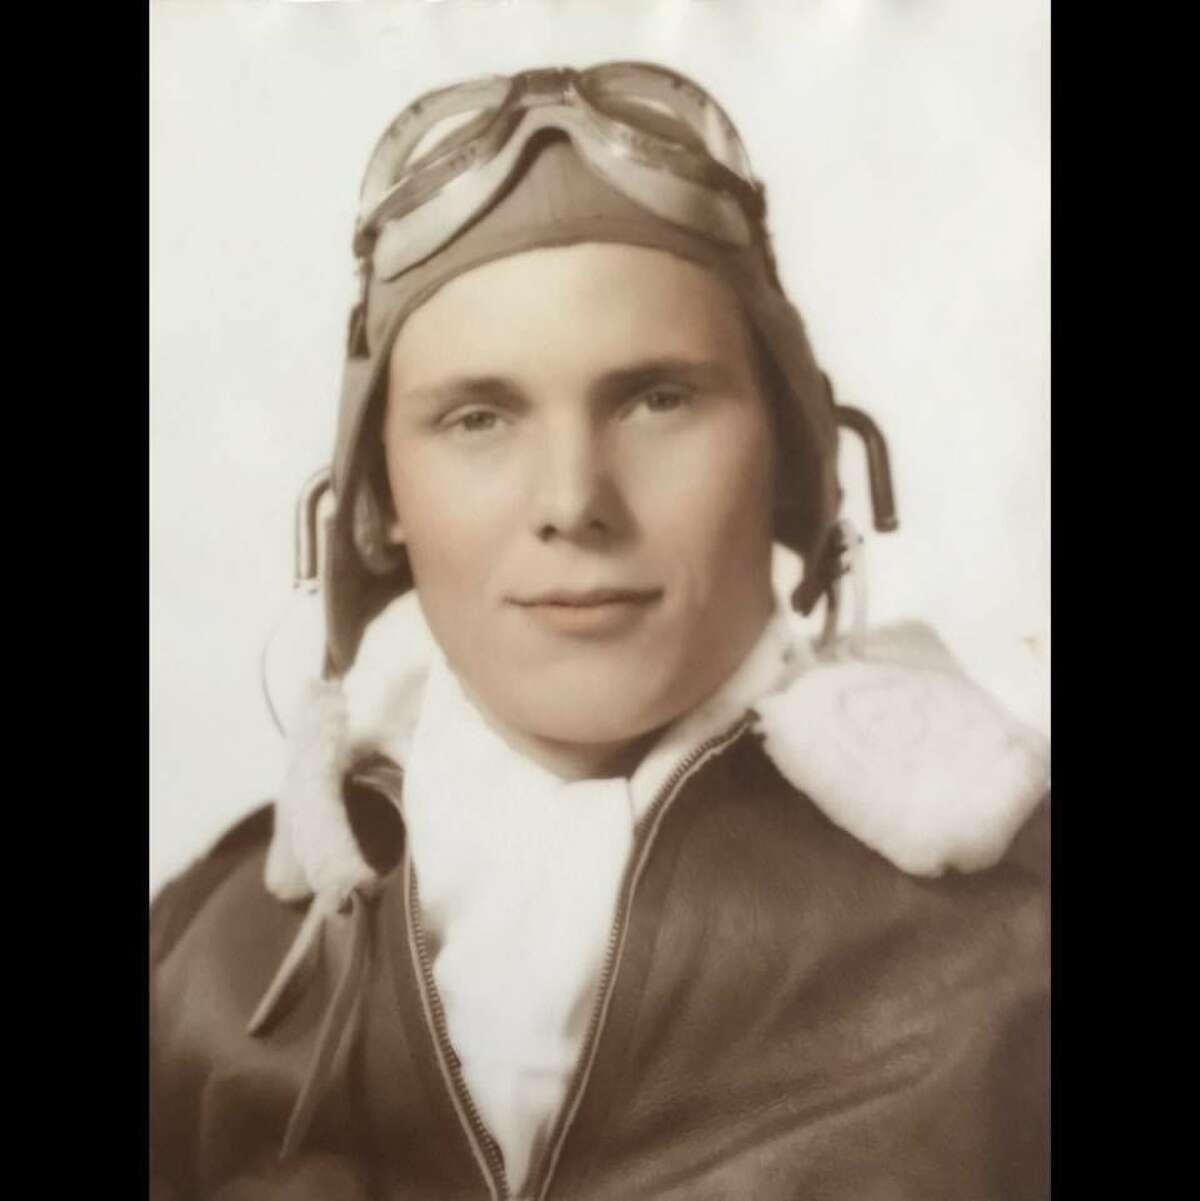 Robert Eugene Marsh, a First Lt. bomber pilot in World War II.